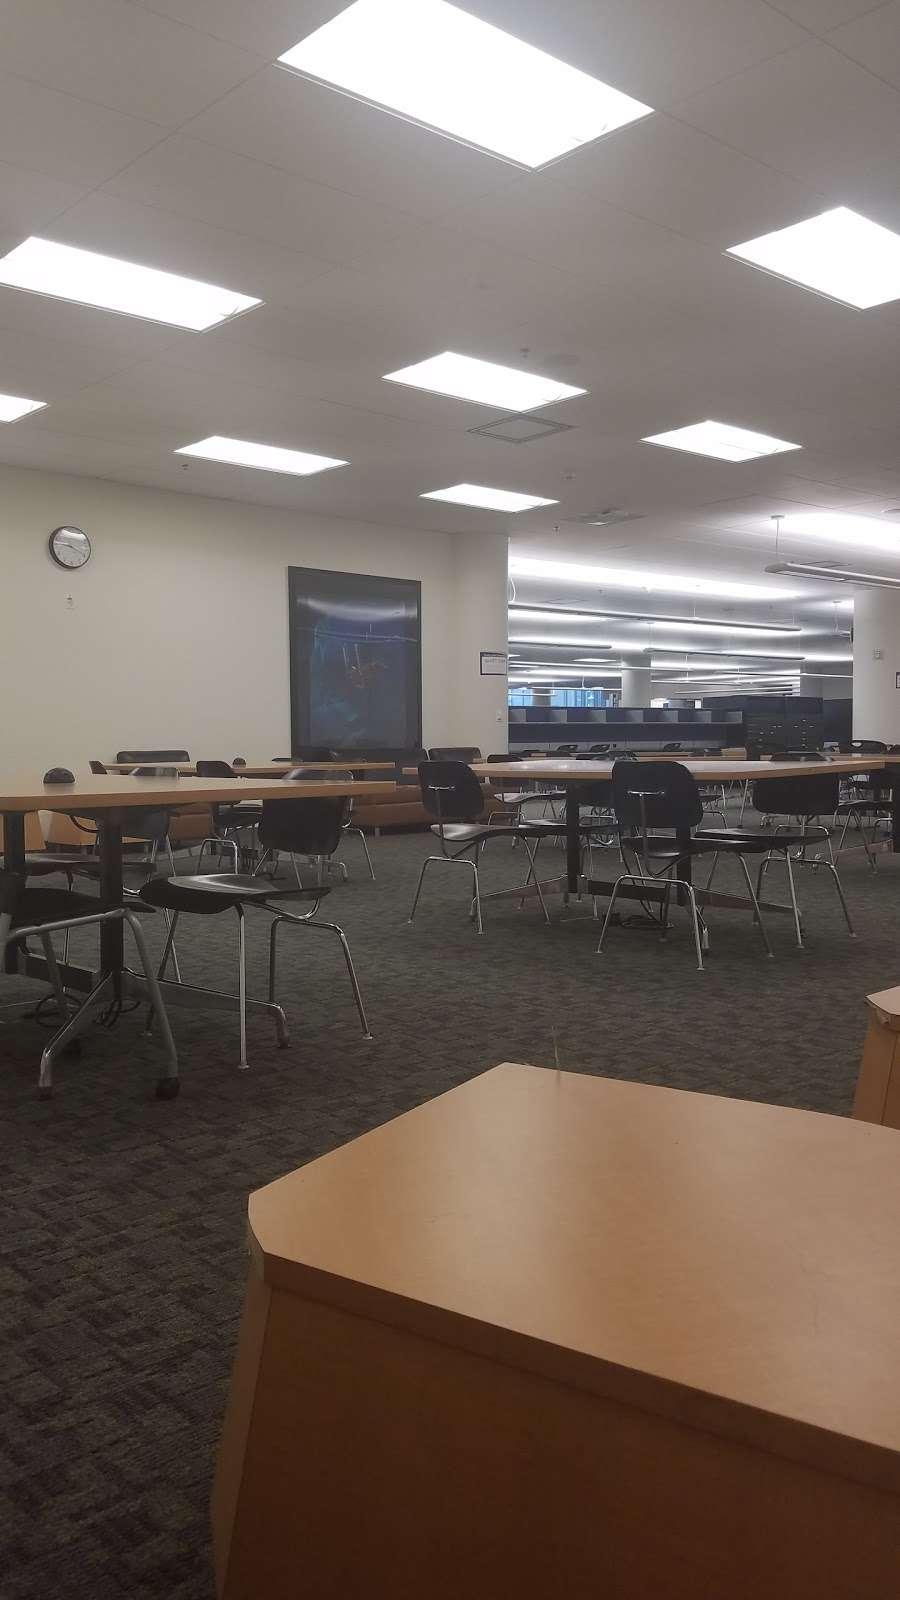 Orange Coast College Library - library  | Photo 2 of 3 | Address: Costa Mesa, CA 92626, USA | Phone: (714) 432-5885